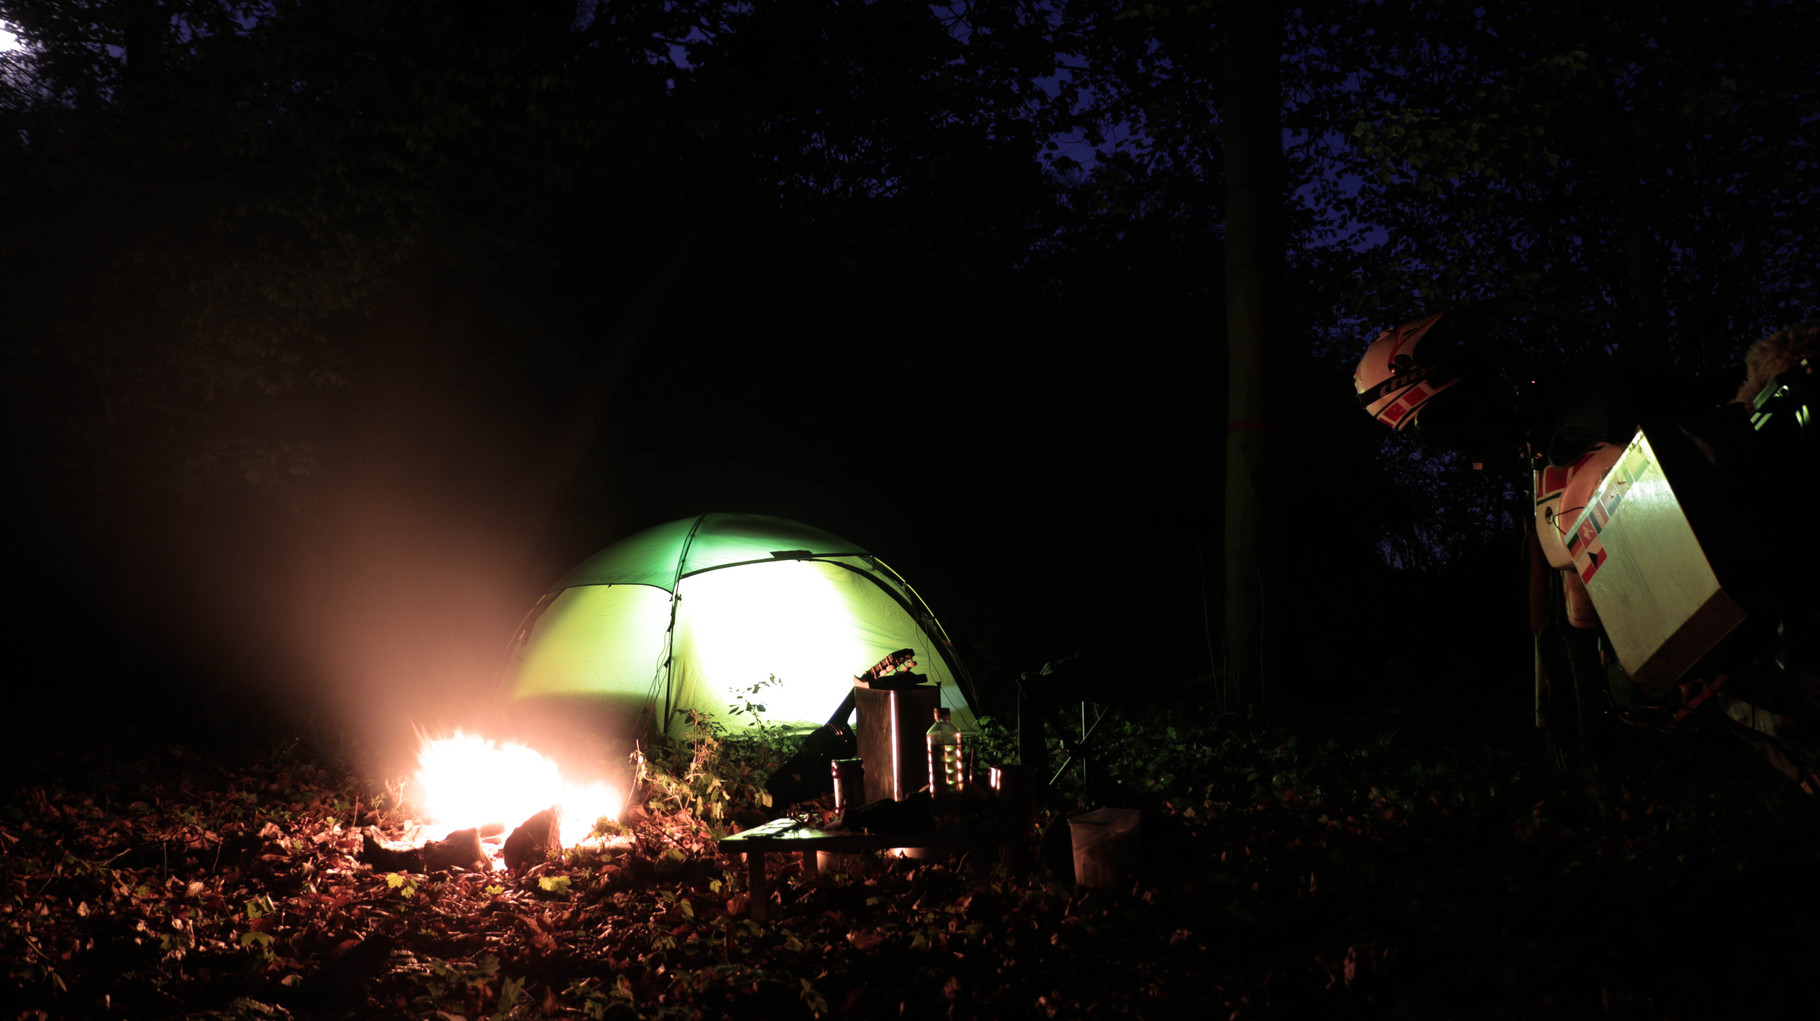 Wildcampen in Tschechien